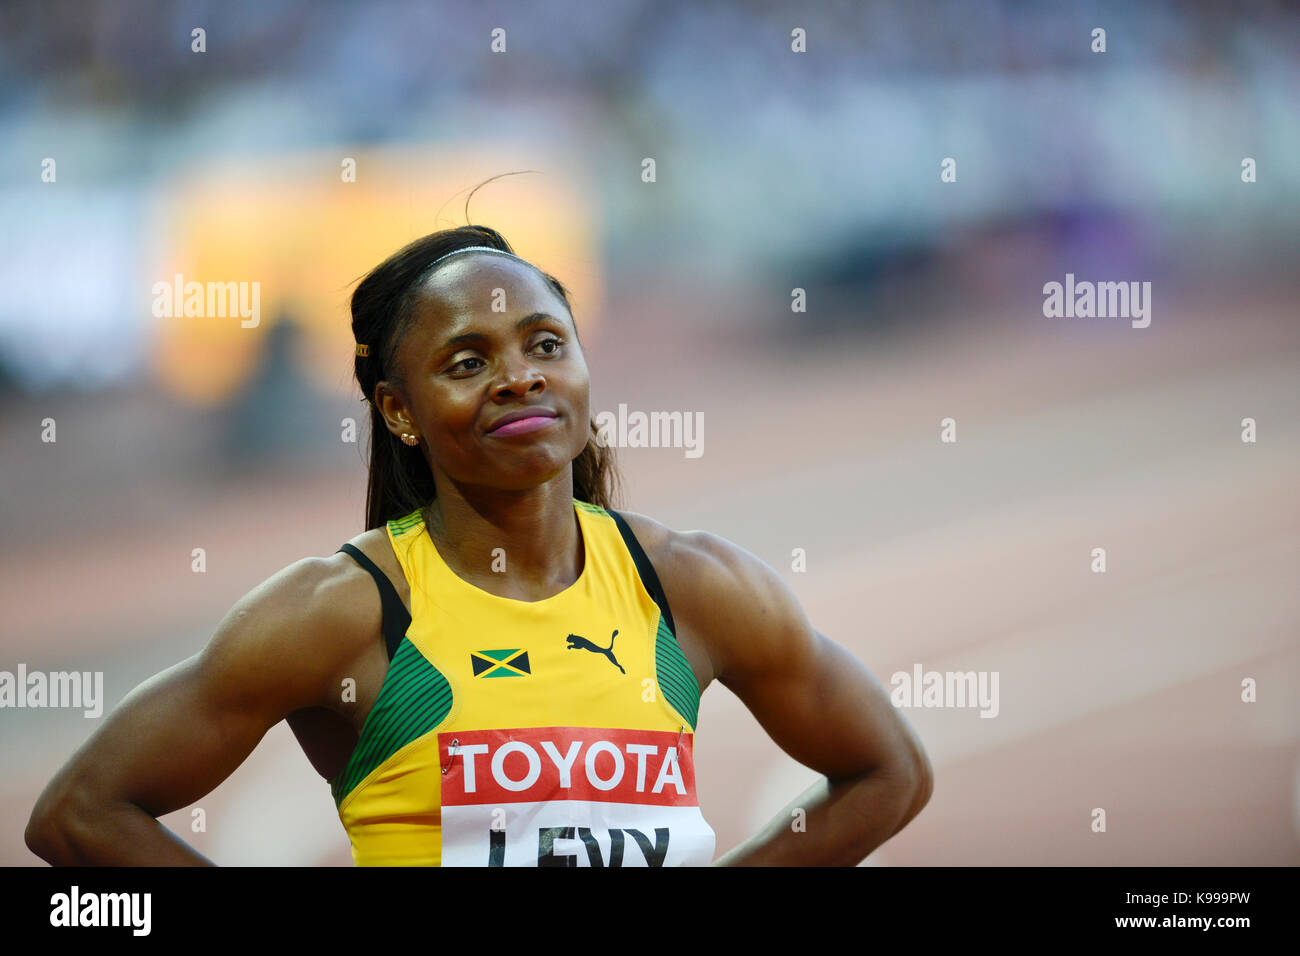 Jura Levy - 100m women - IAAF Athletics World Championships - London 2017 - Stock Image